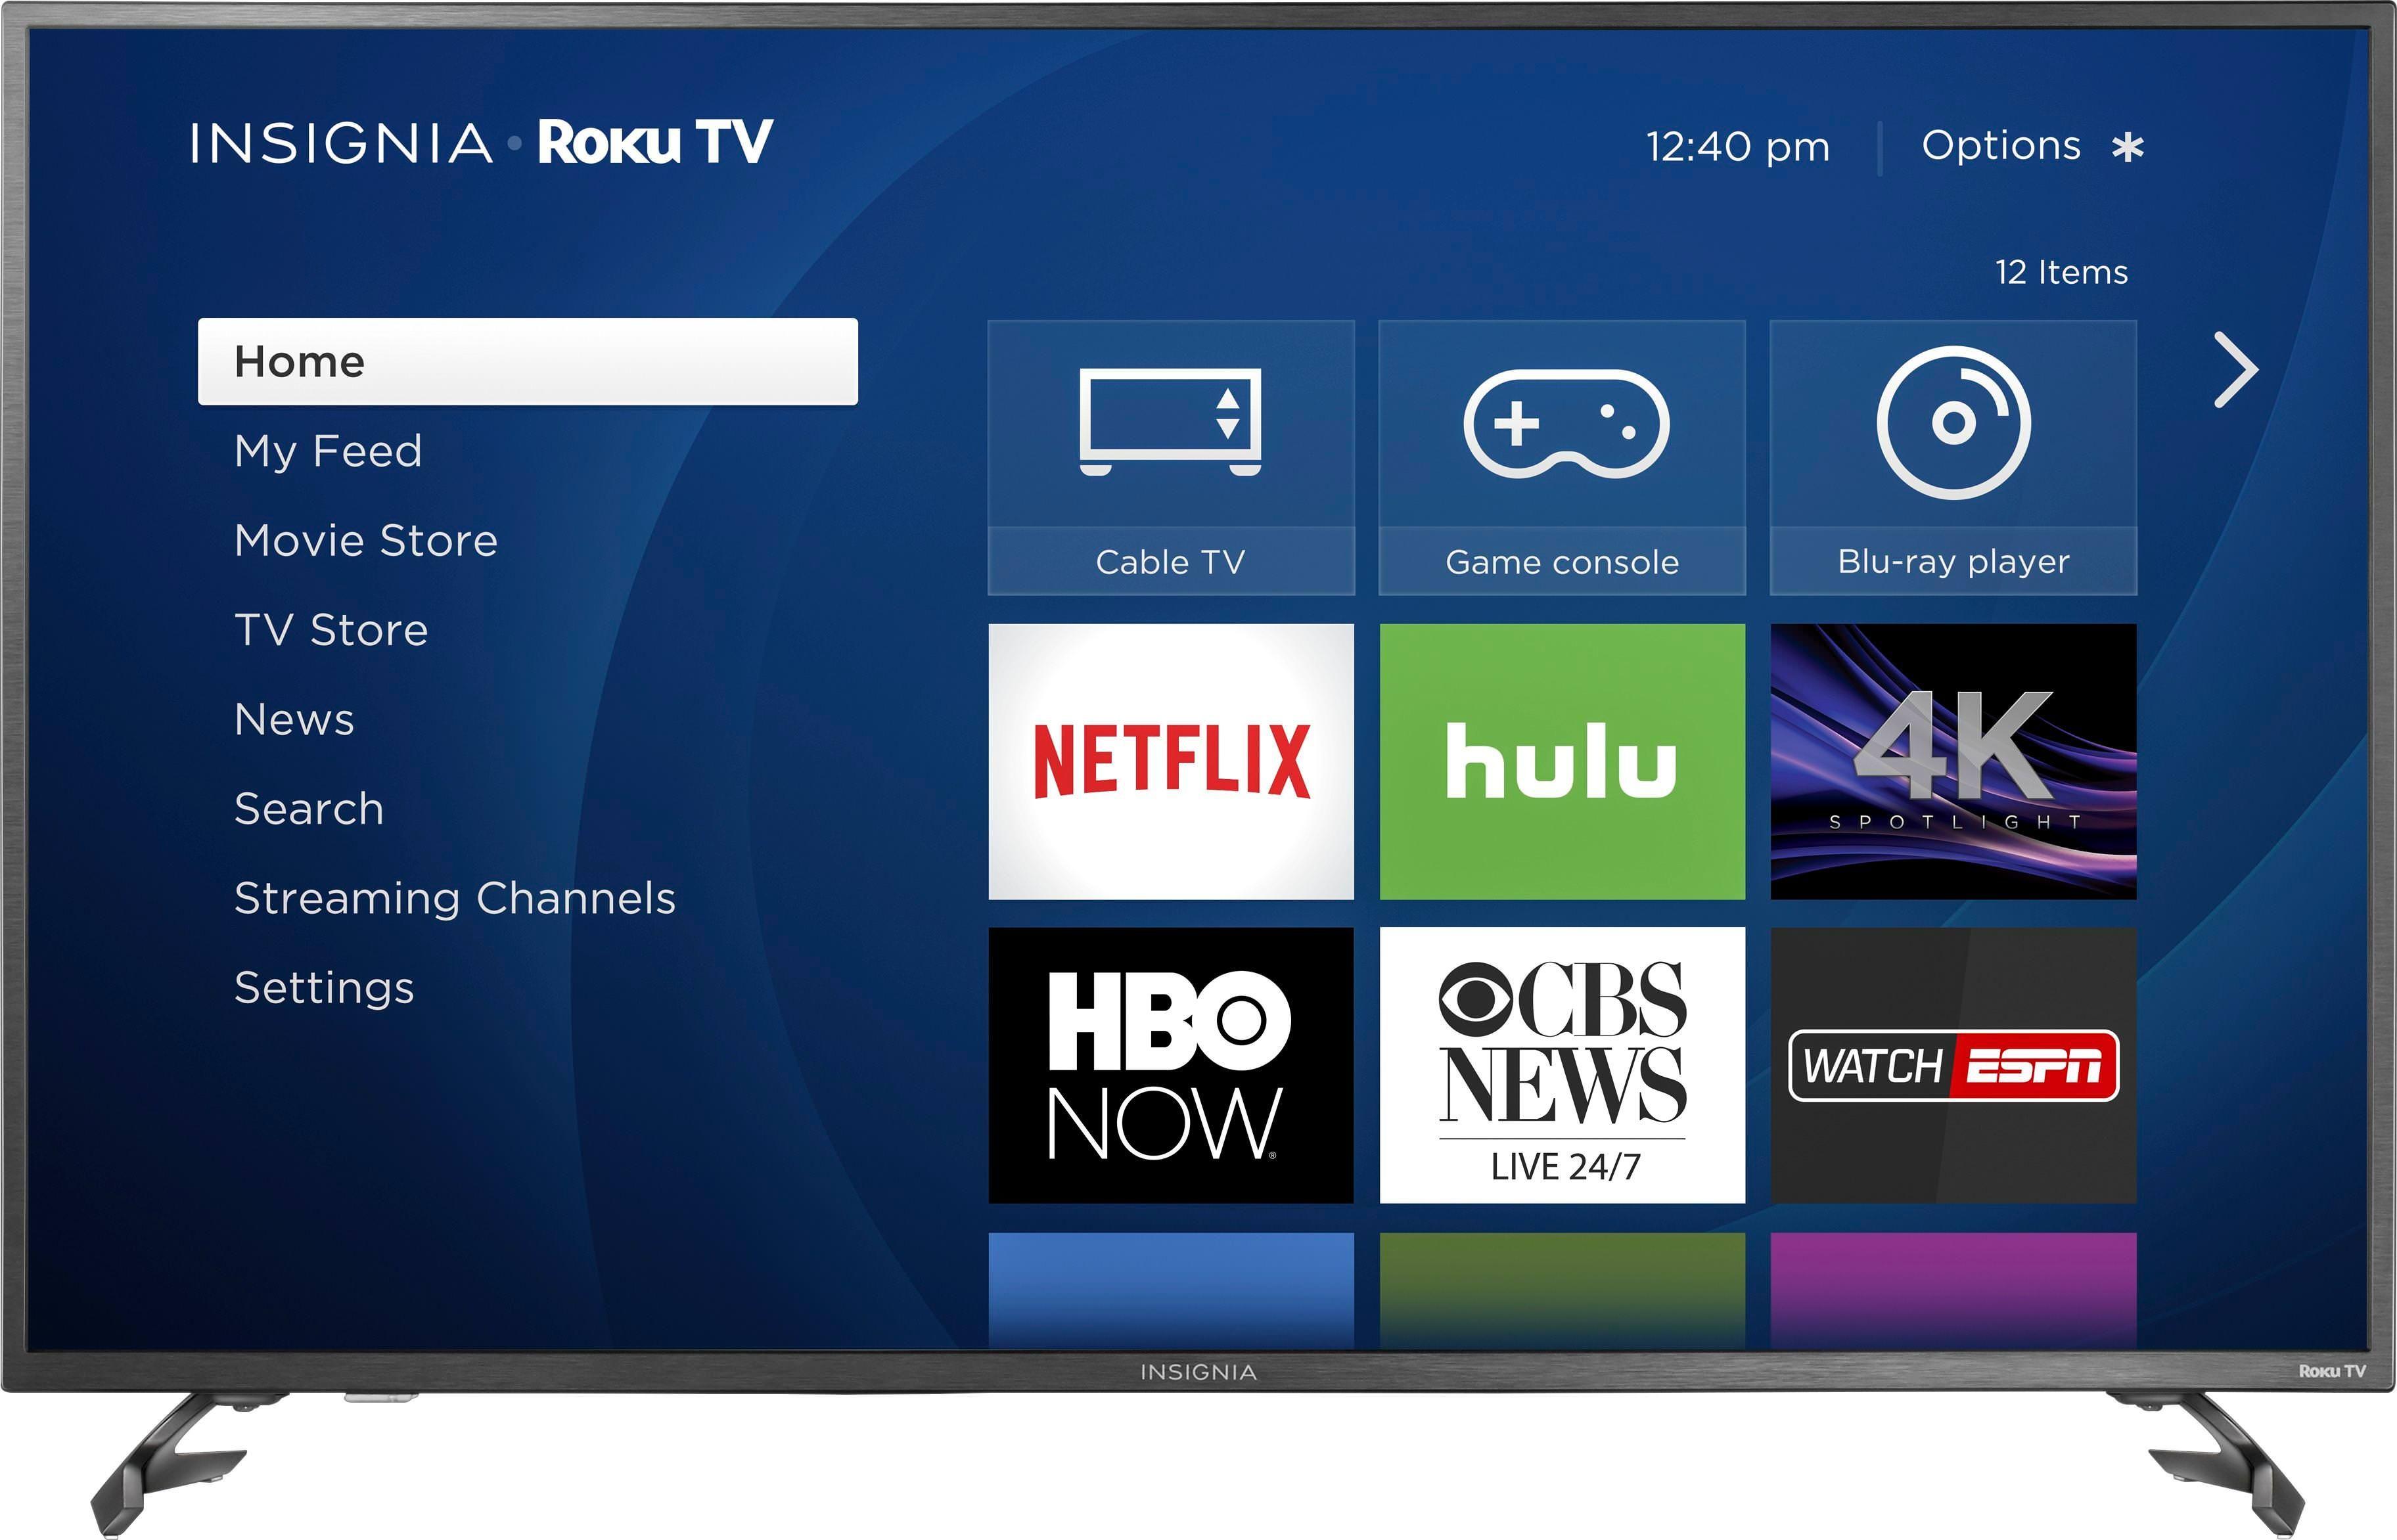 Top 5 4k Tvs For Sale Best 4k Uhd Tv Deals 2020 Cool Things To Buy 4k Ultra Hd Tvs Uhd Tv